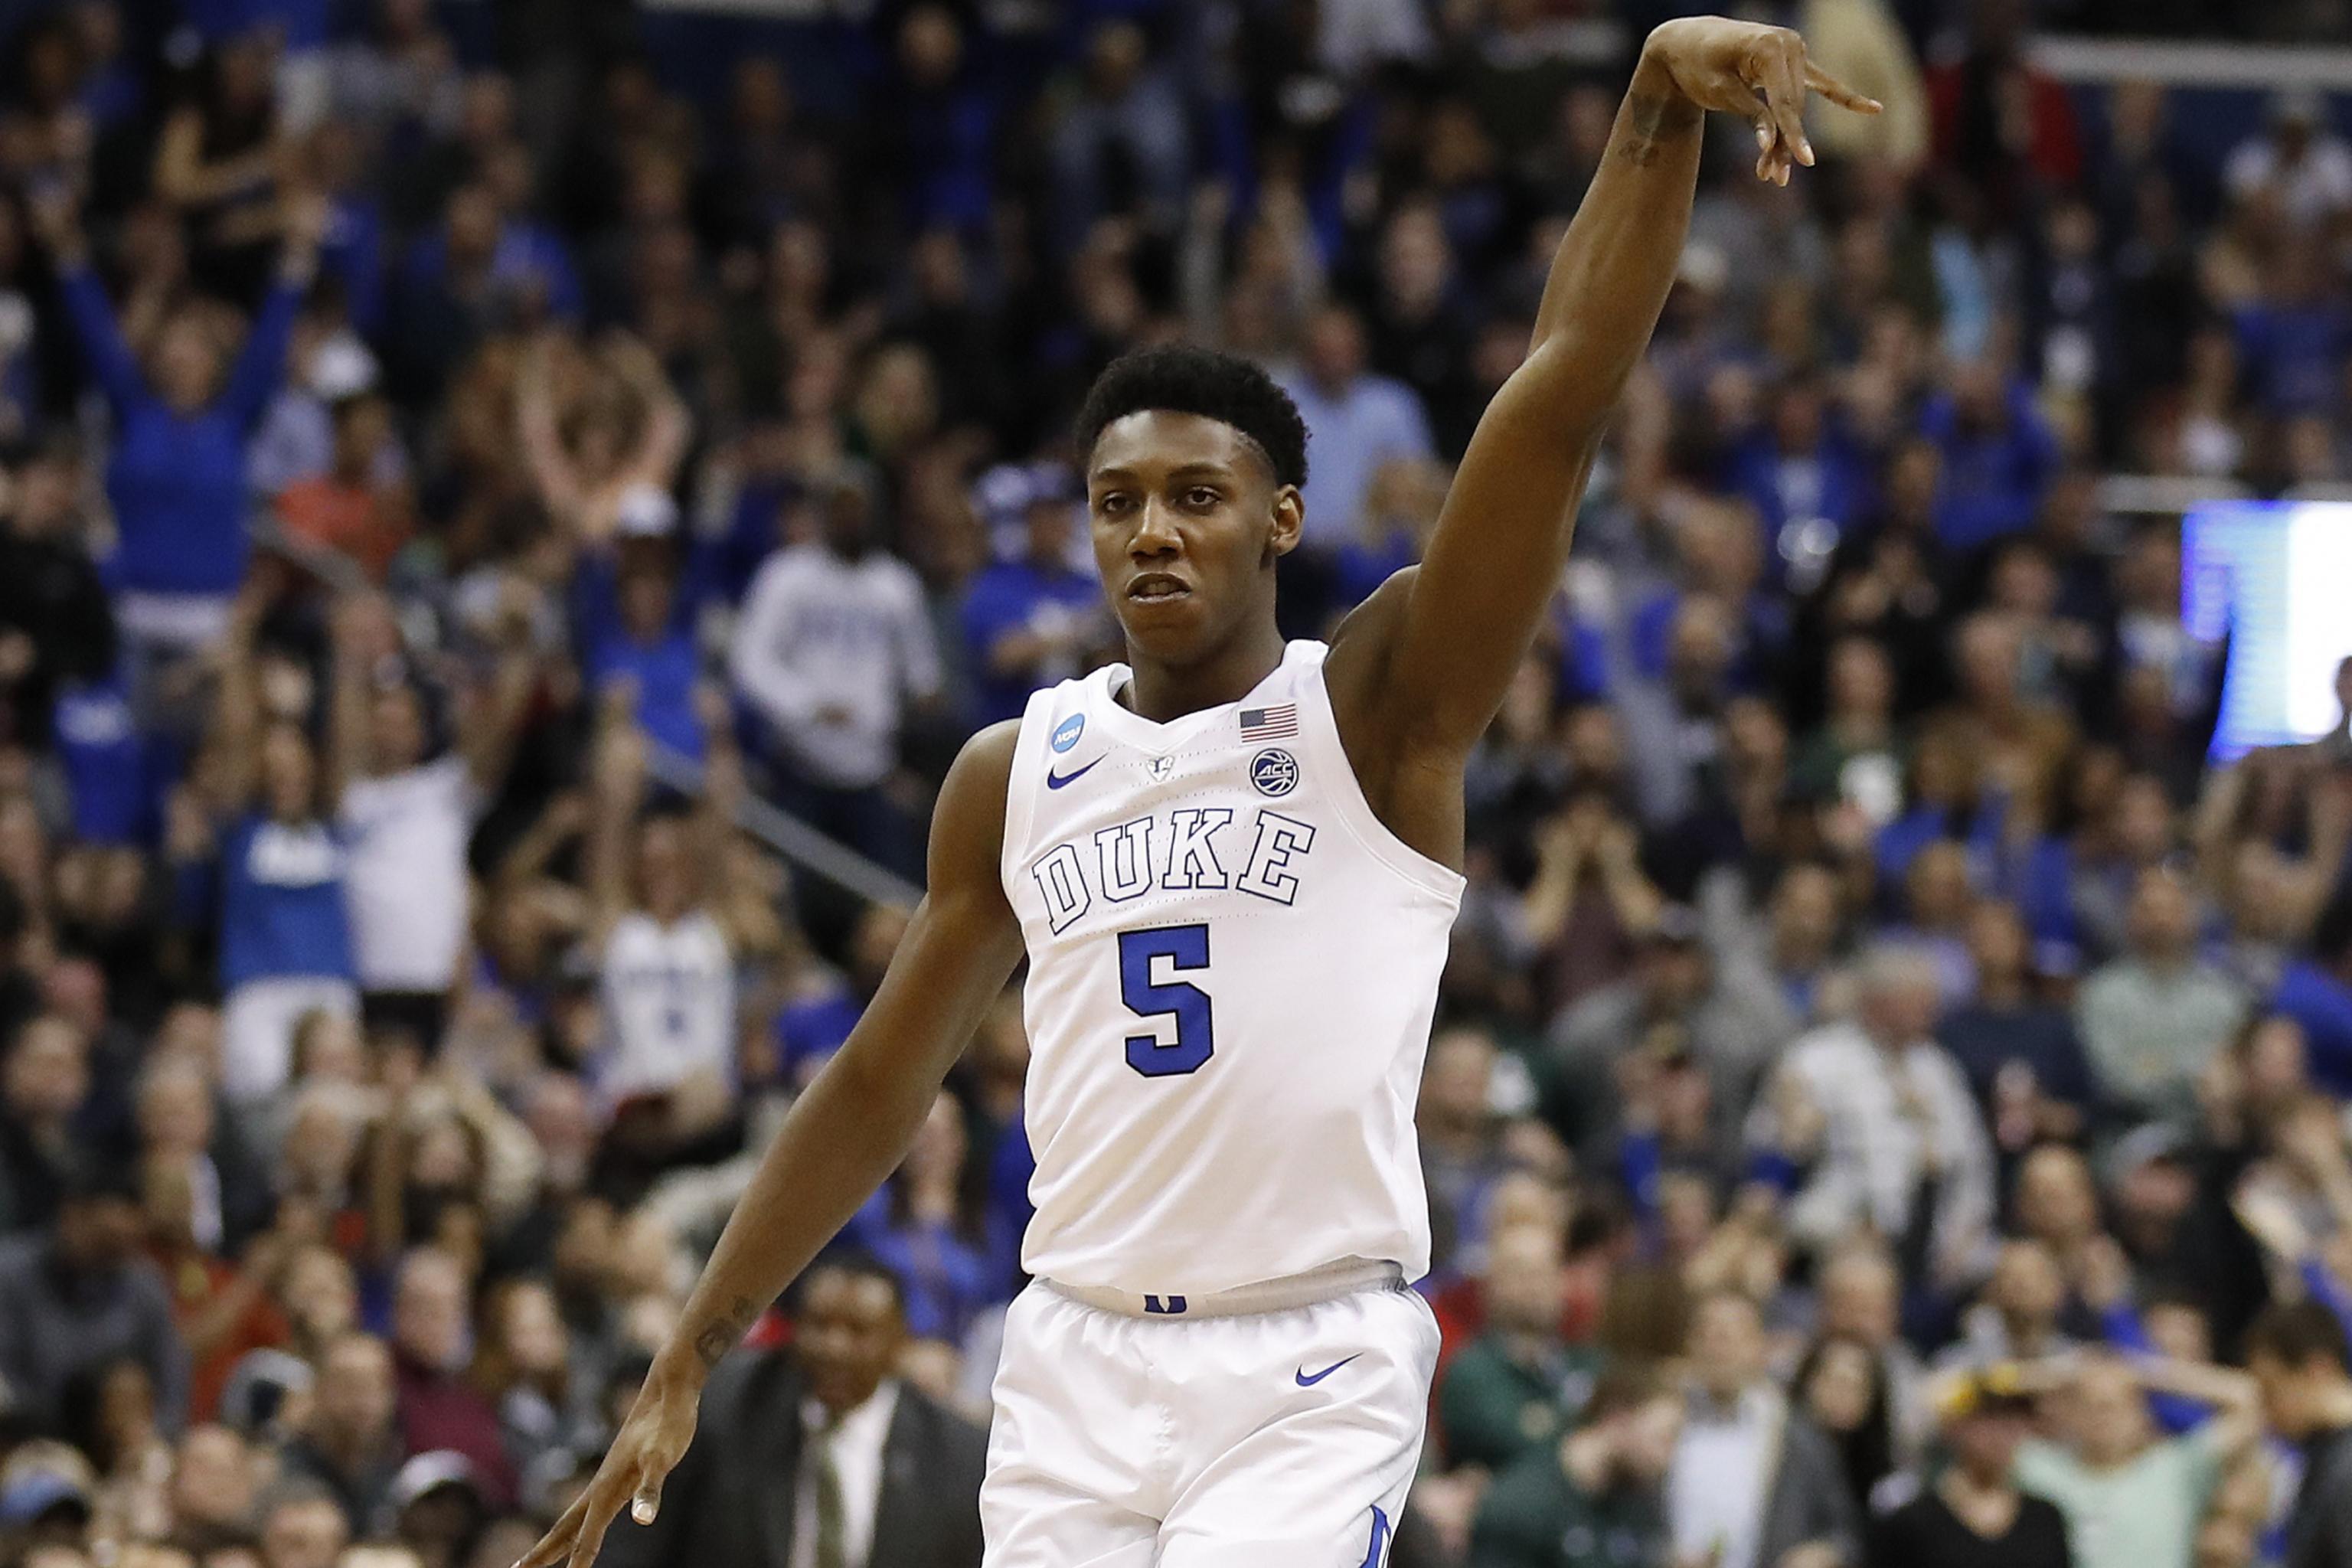 2019 NBA Draft Rumors: Cavs Official Has RJ Barrett on 'Same